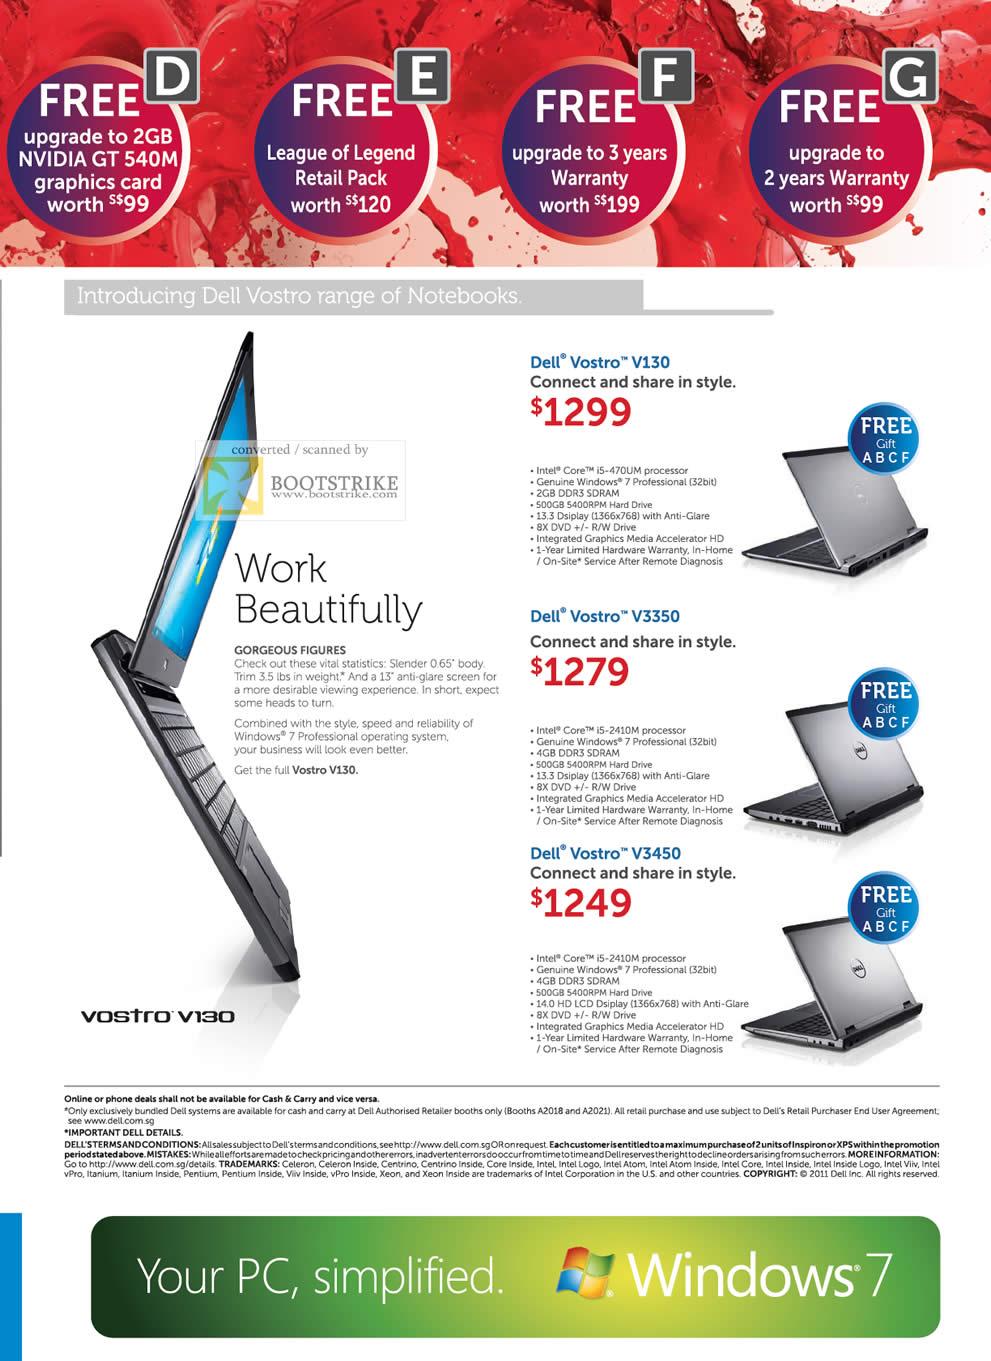 PC Show 2011 price list image brochure of Dell Notebooks Business Vostro V130 V3350 V3450